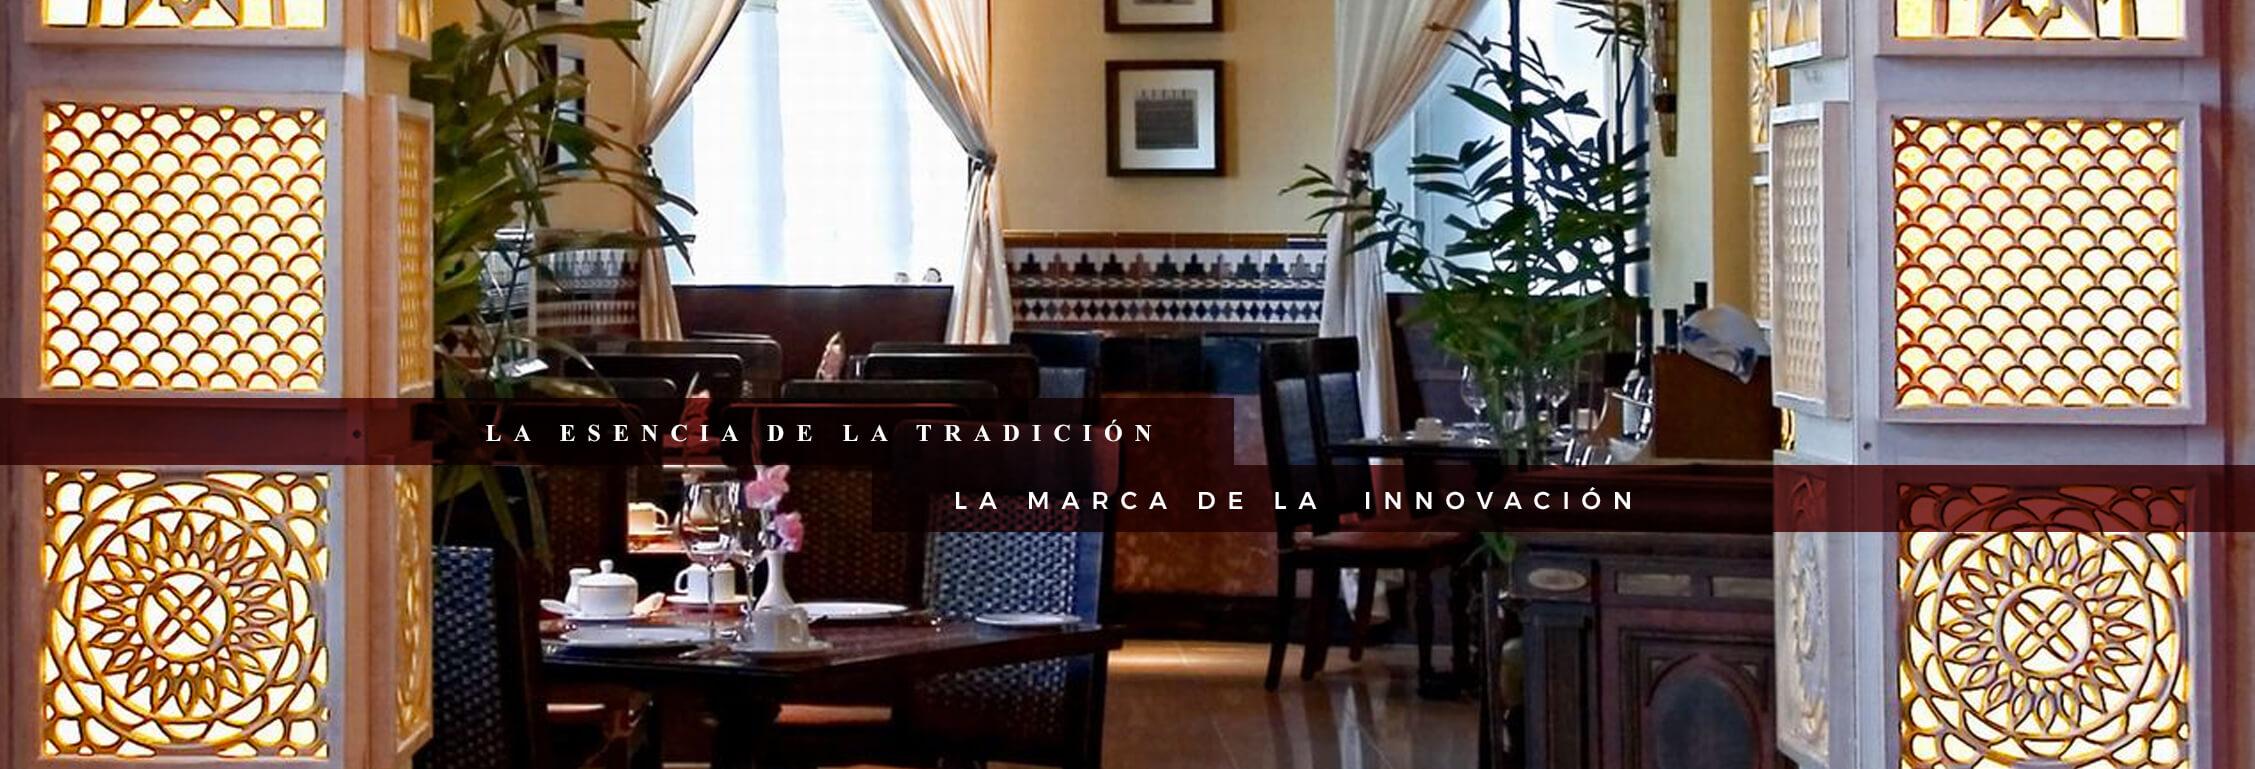 Gastonomía | Hotel Saratoga Habana